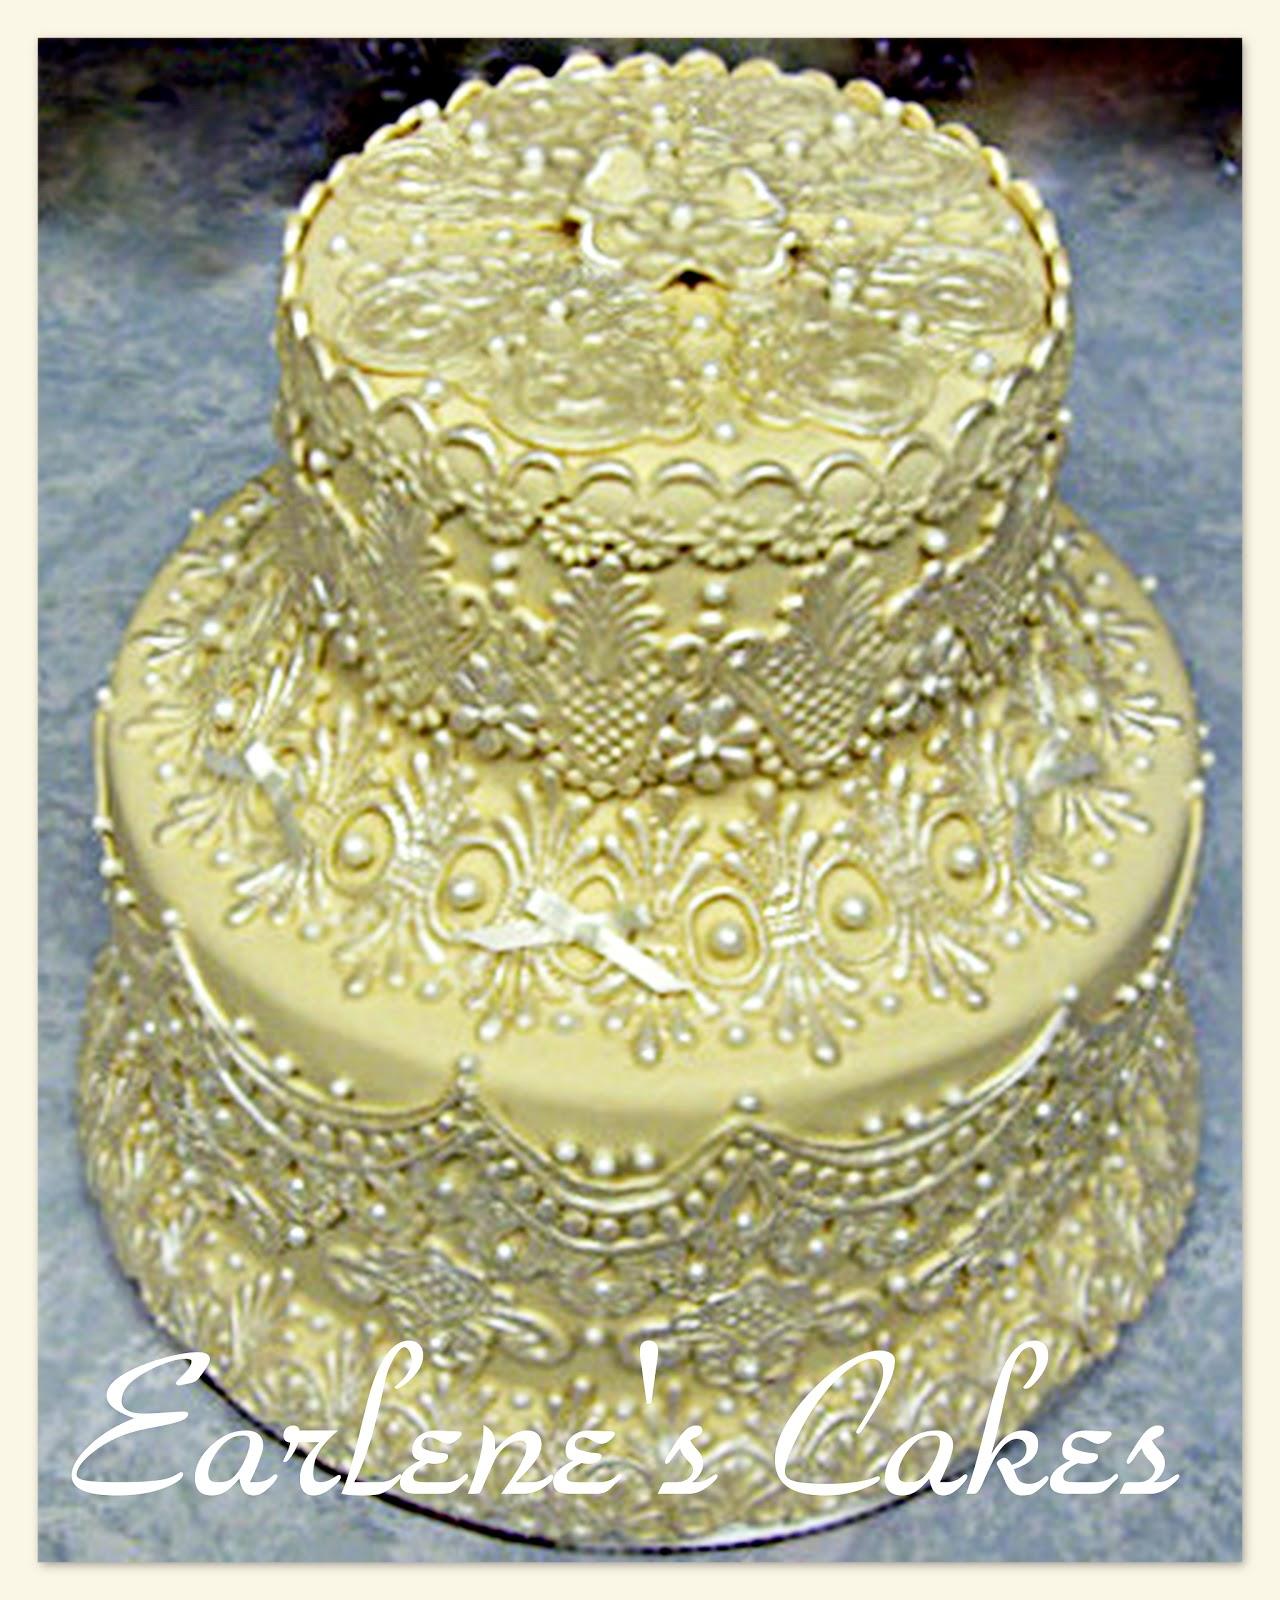 Lace For Cake Decorating : ~ Sugar Teachers ~ Cake Decorating and Sugar Art Tutorials ...